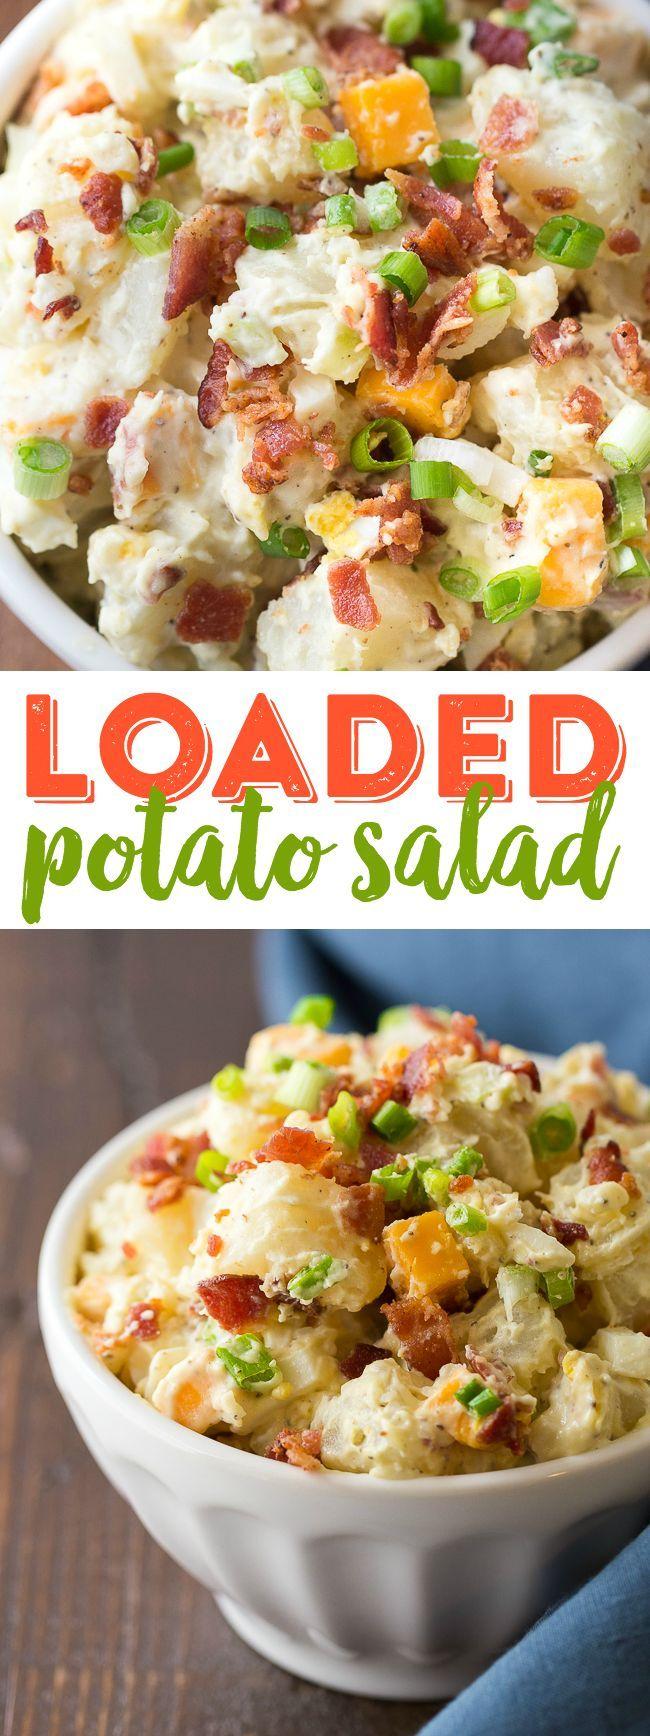 Loaded Potato Salad Recipe   Loaded Ranch Potato Salad   Bacon Potato Salad   Potato Salad with Cheese